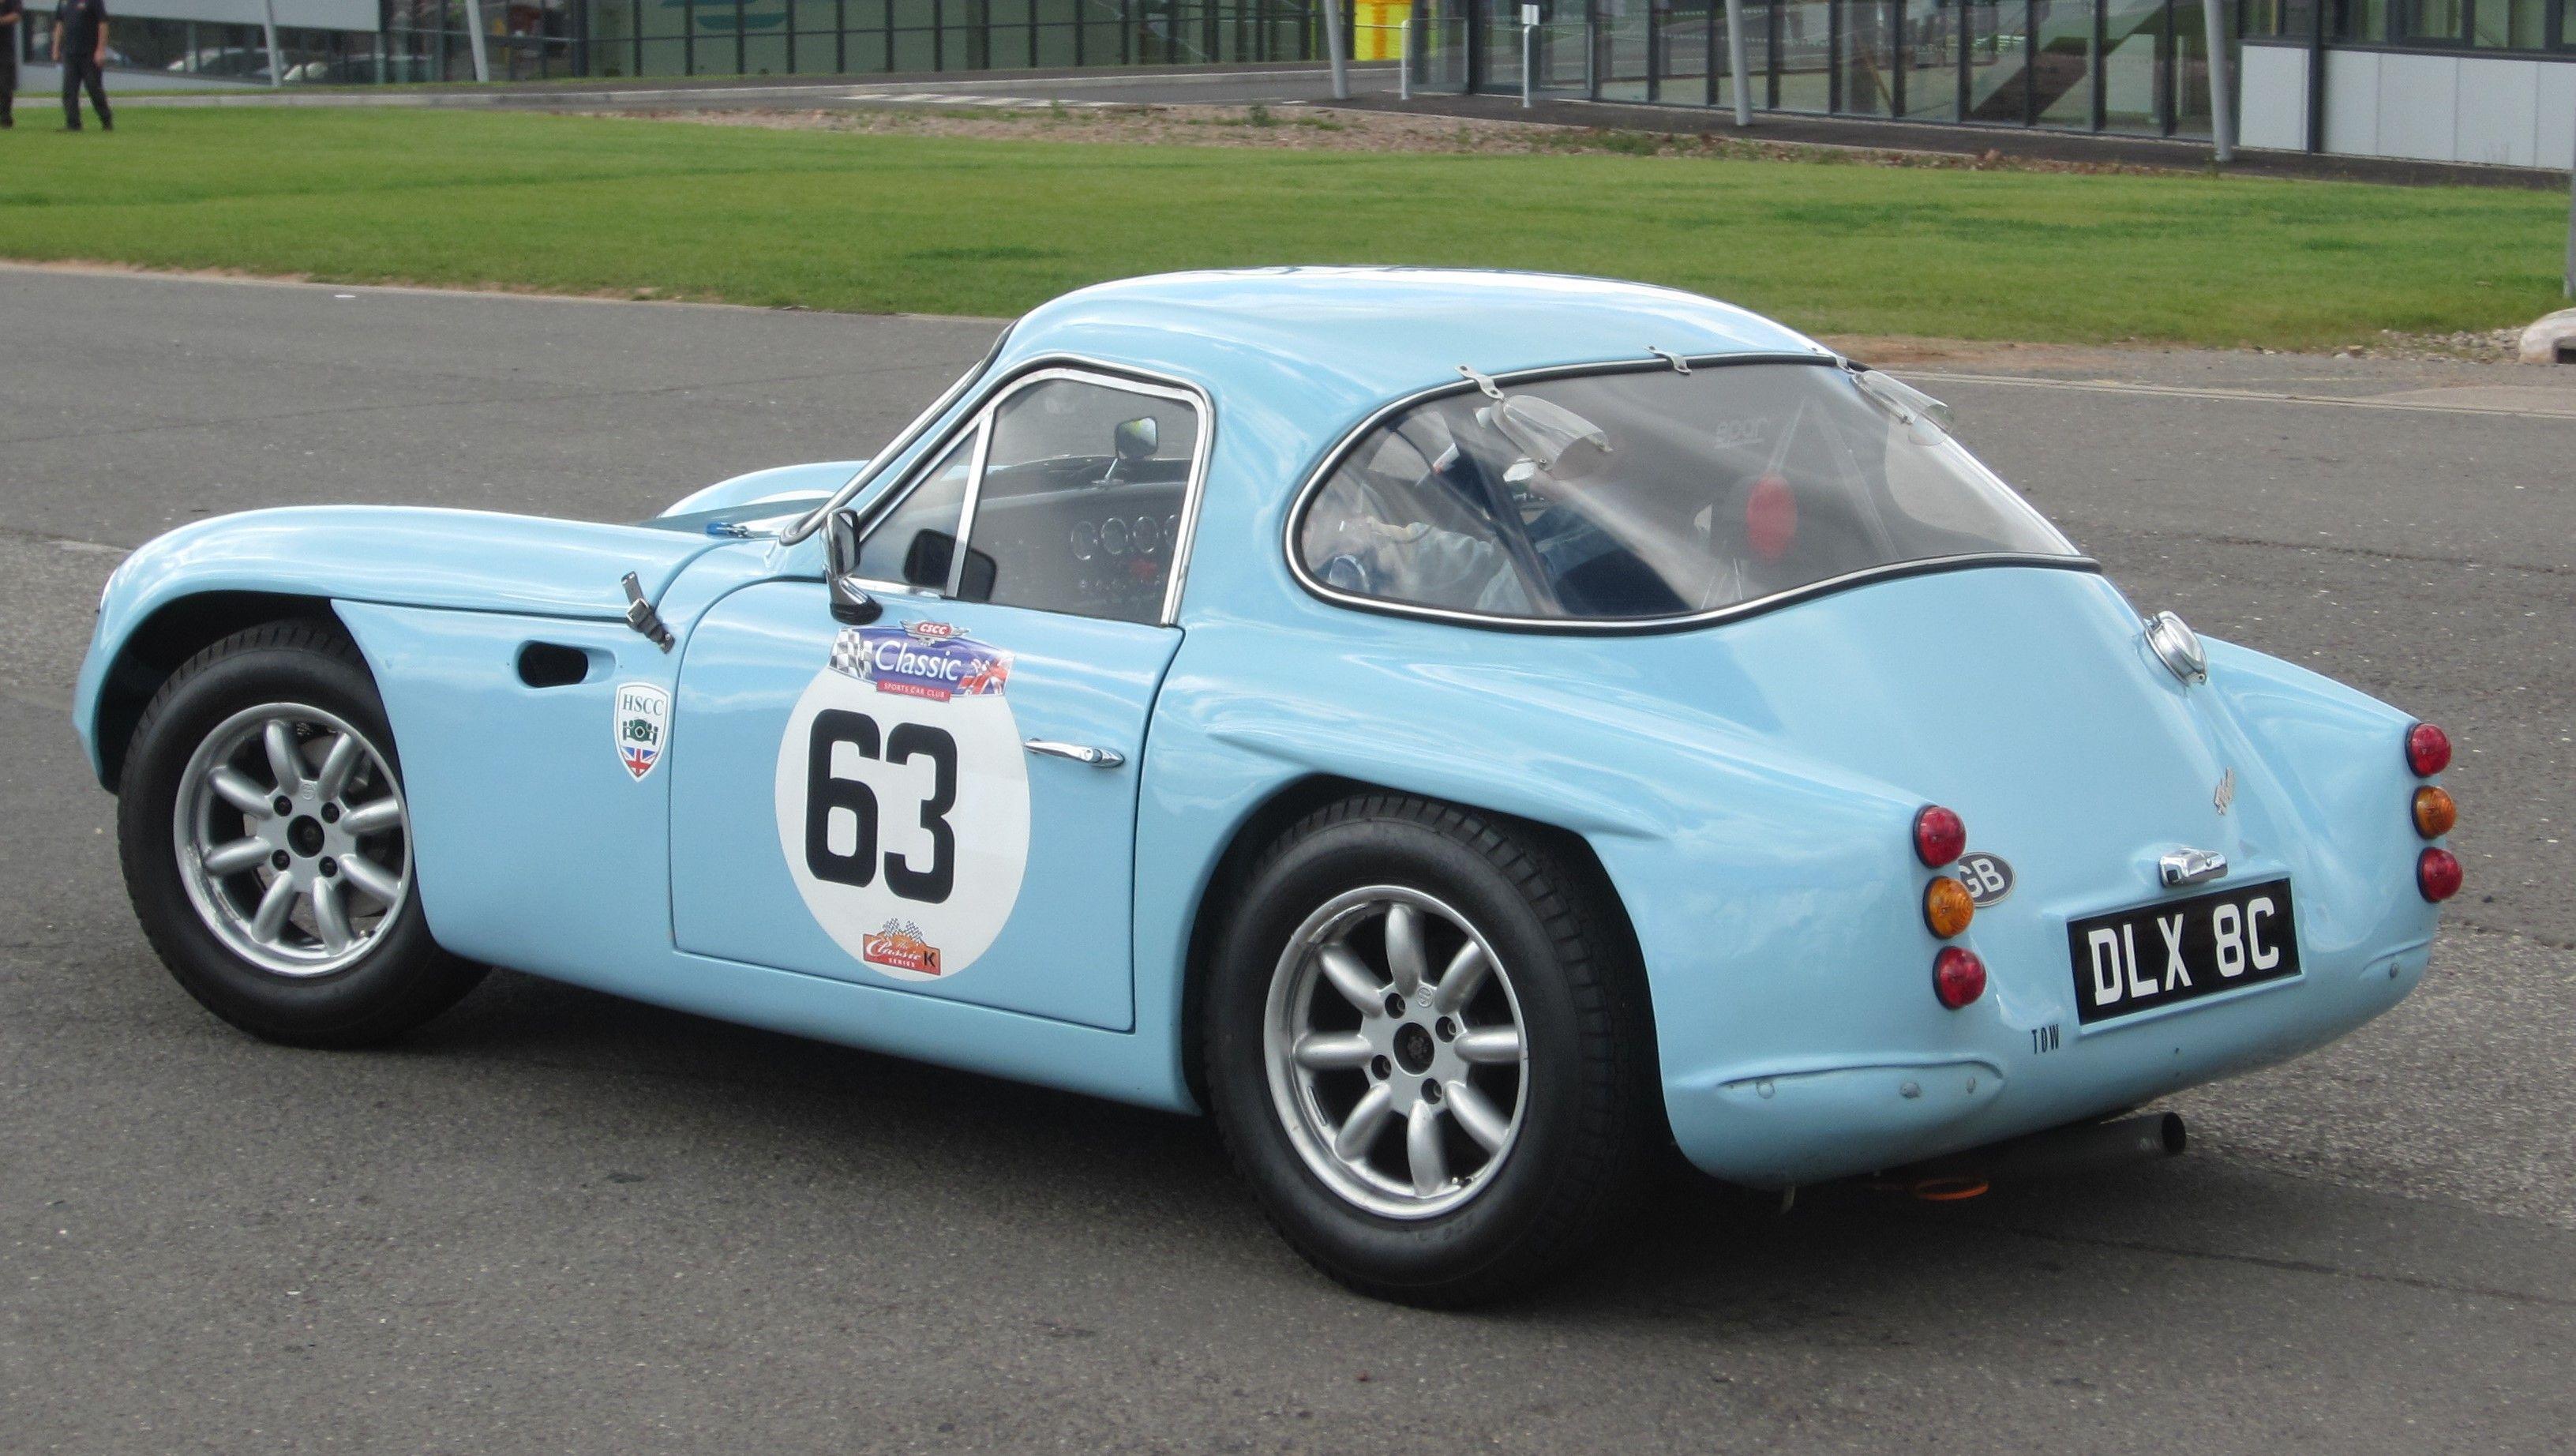 1963 TVR Grantura Mk.III (E) (CK) | Vintage motorsport | Pinterest ...